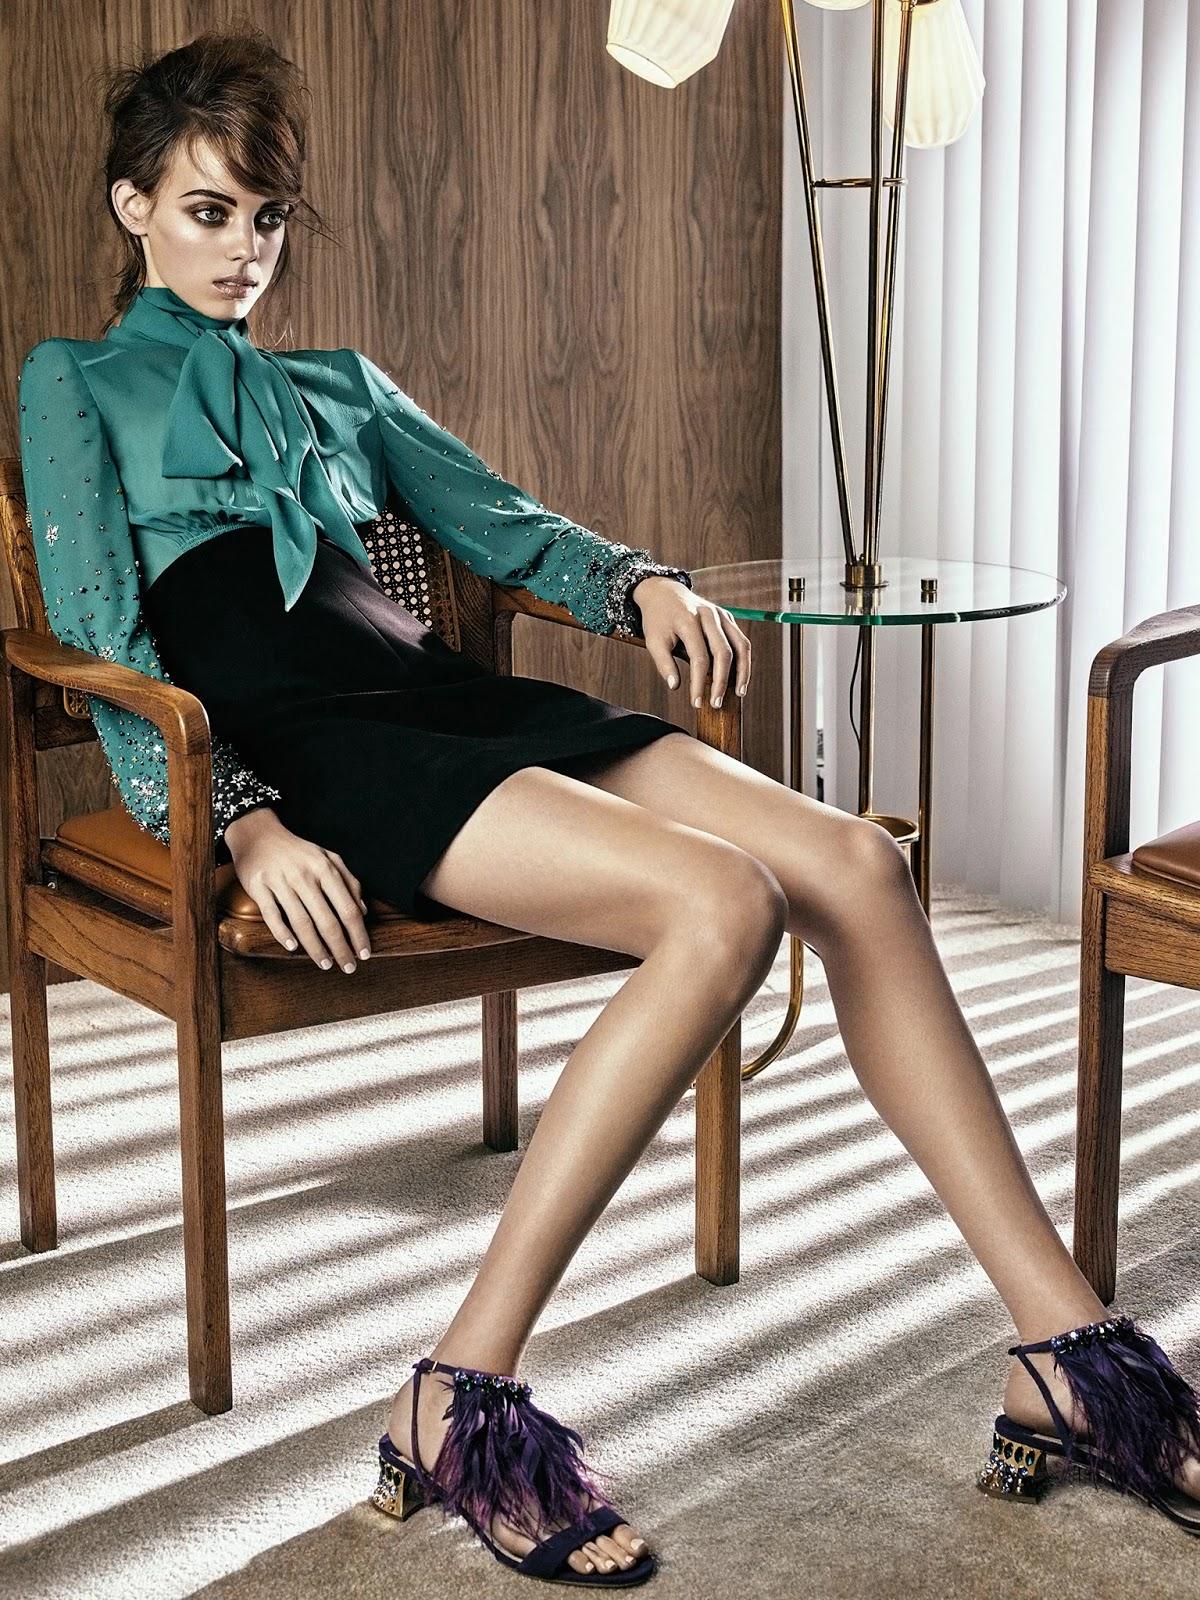 2017 05 kayla autumn ward legs - Set Design Juliet Jernigan